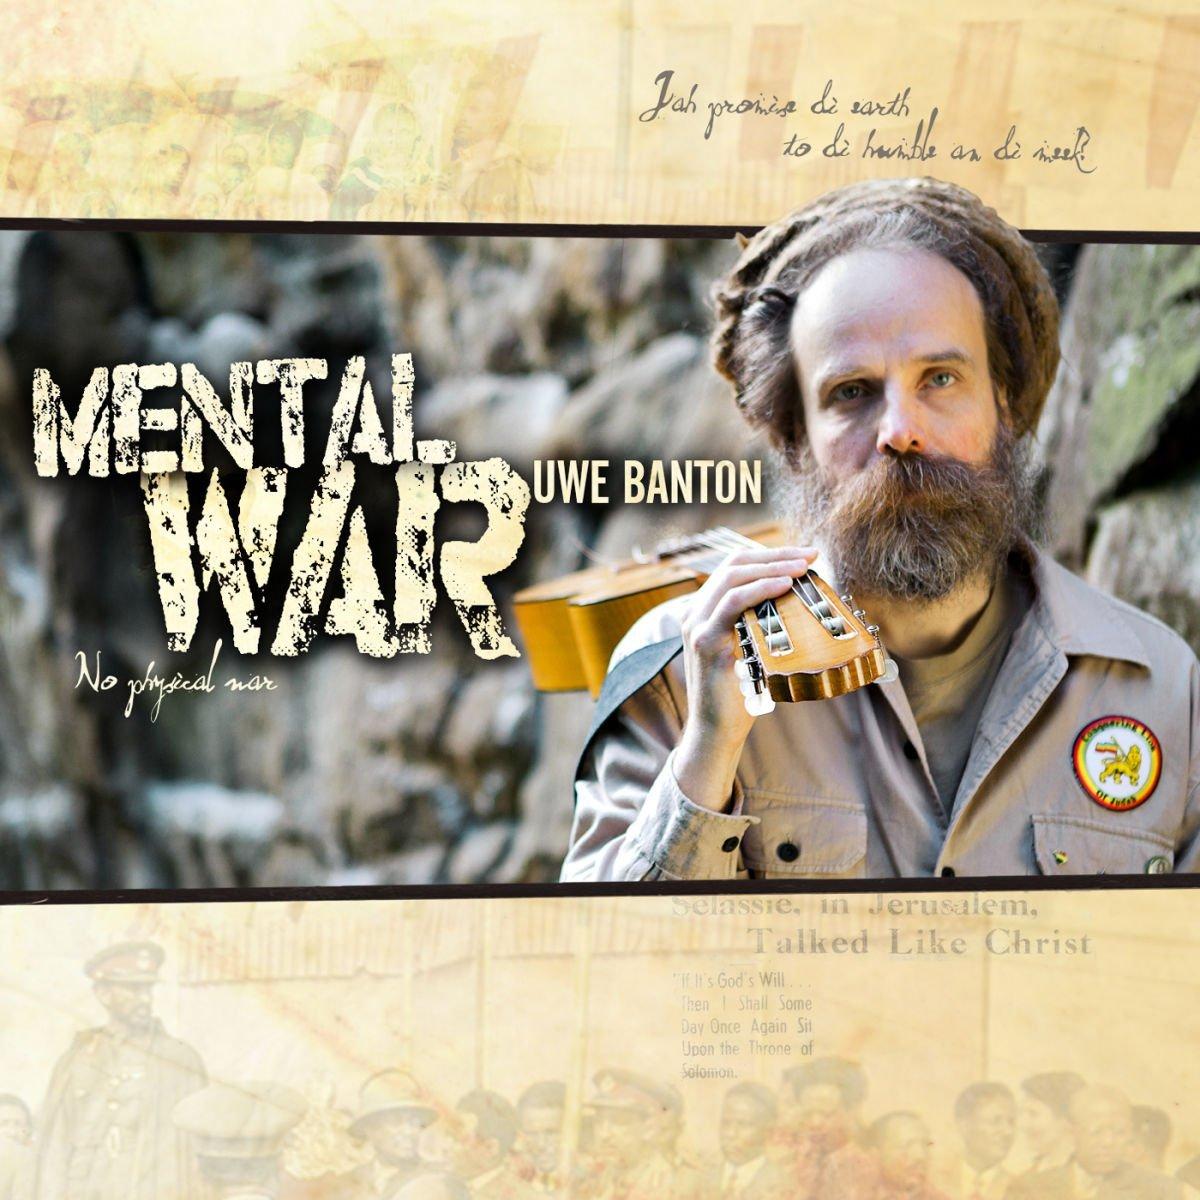 Uwe Banton - duševní válka - album